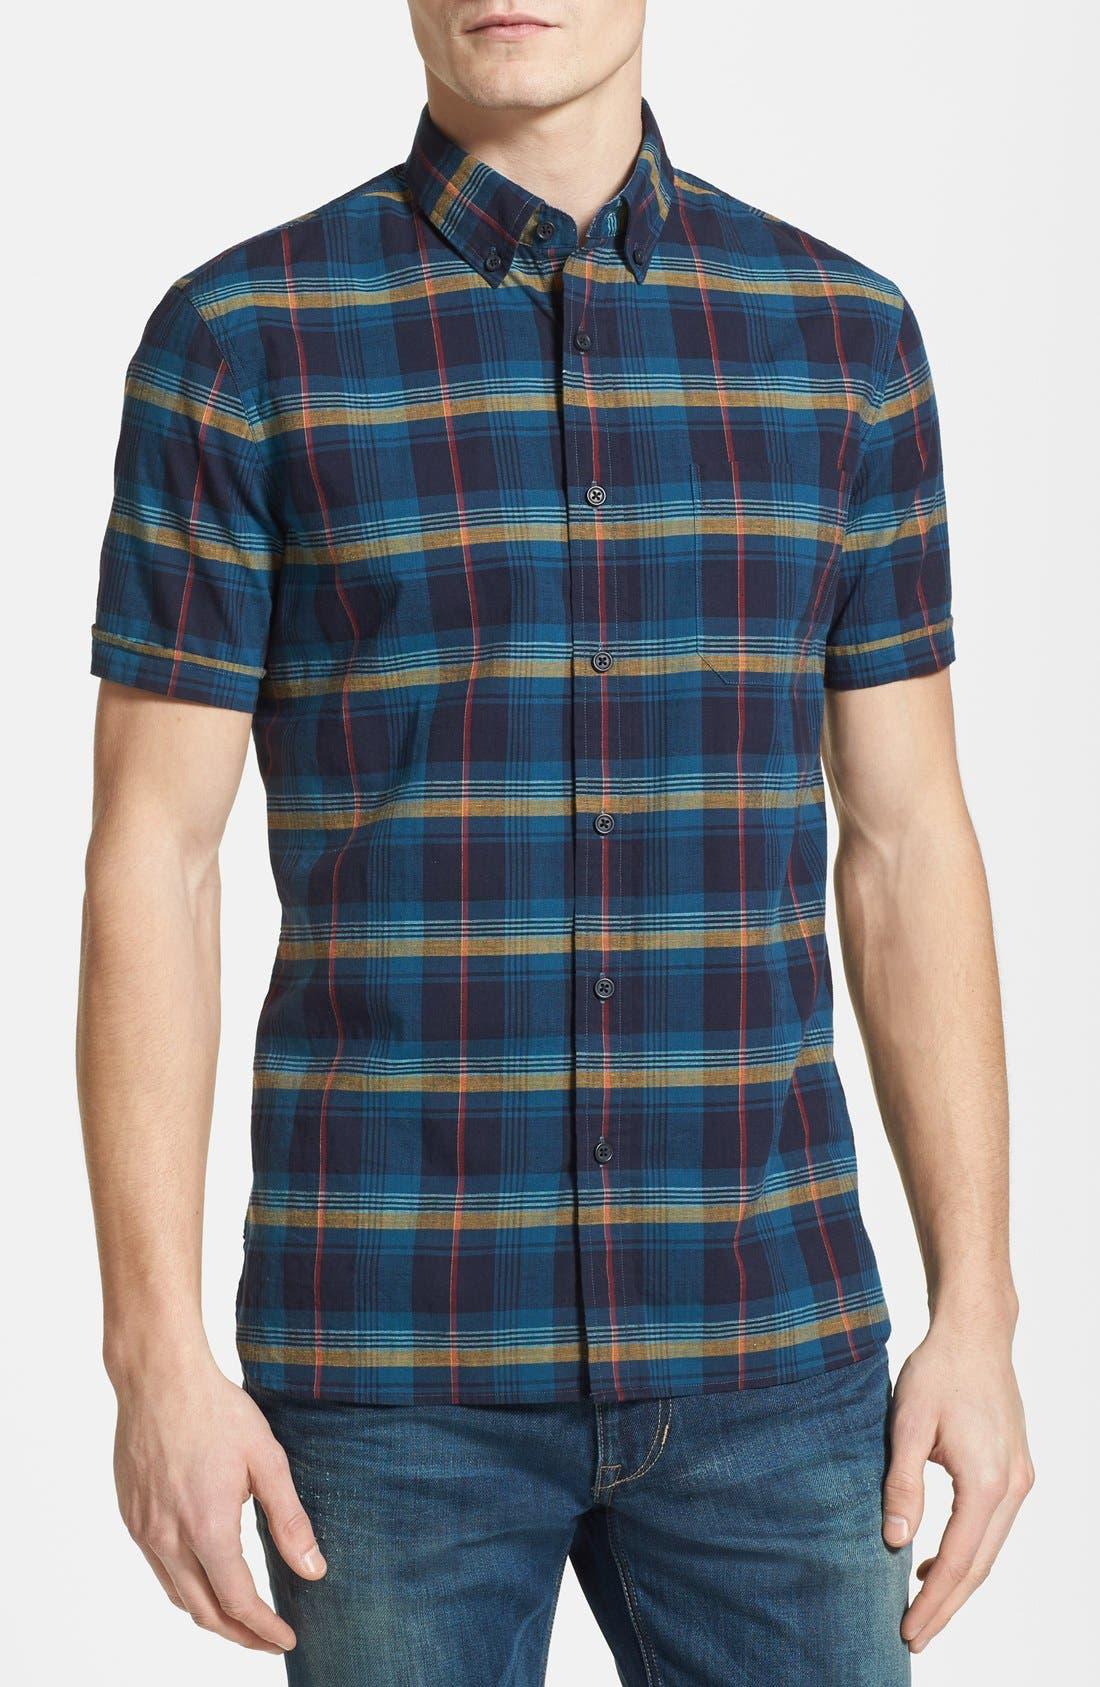 Alternate Image 1 Selected - Wallin & Bros. 'Signature' Trim Fit Short Sleeve Madras Sport Shirt